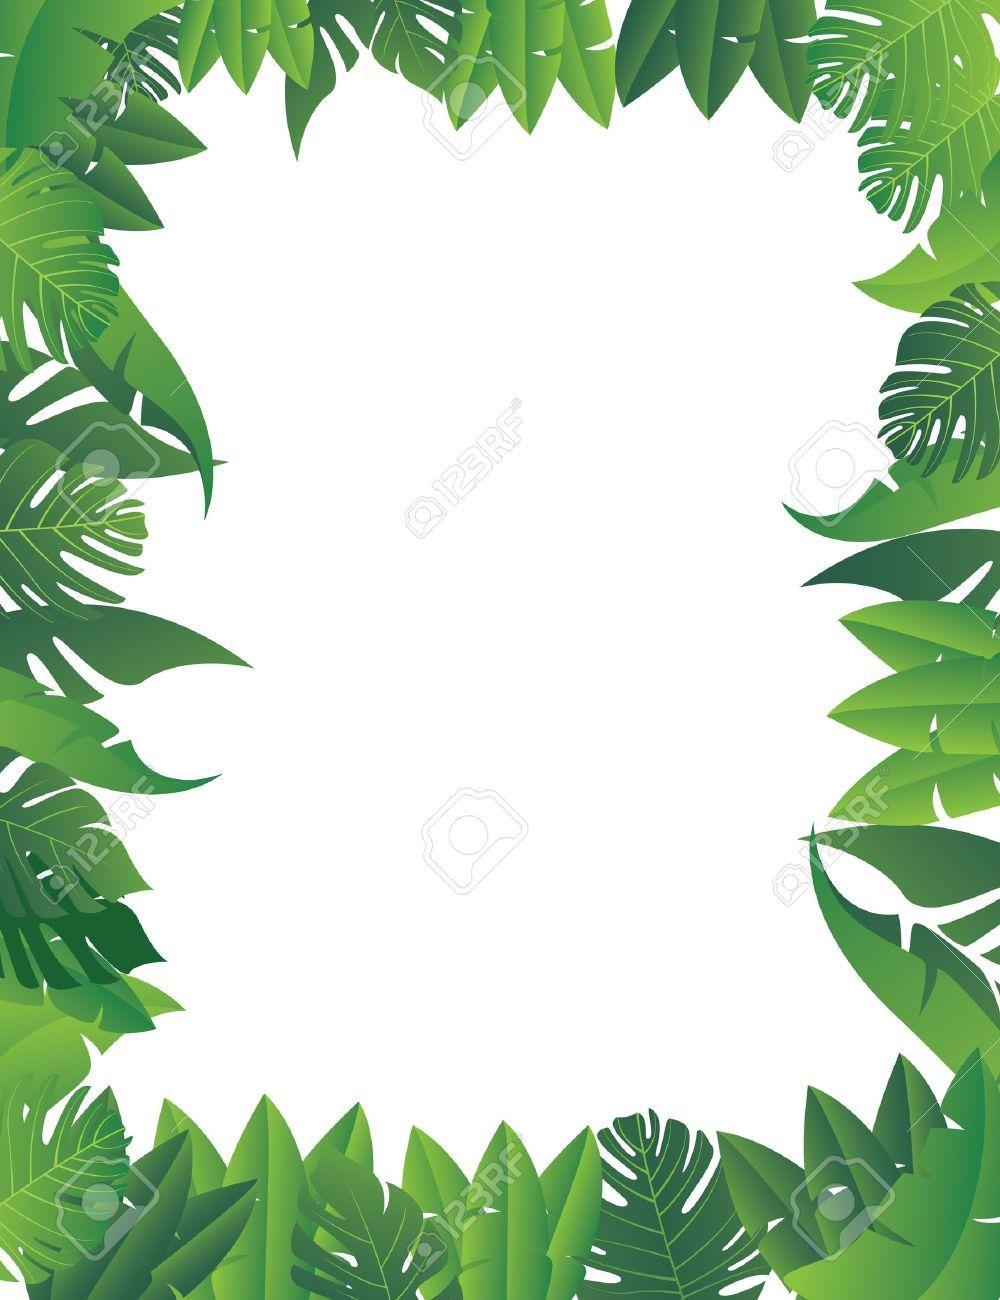 Free jungle border clipart 7 » Clipart Portal.